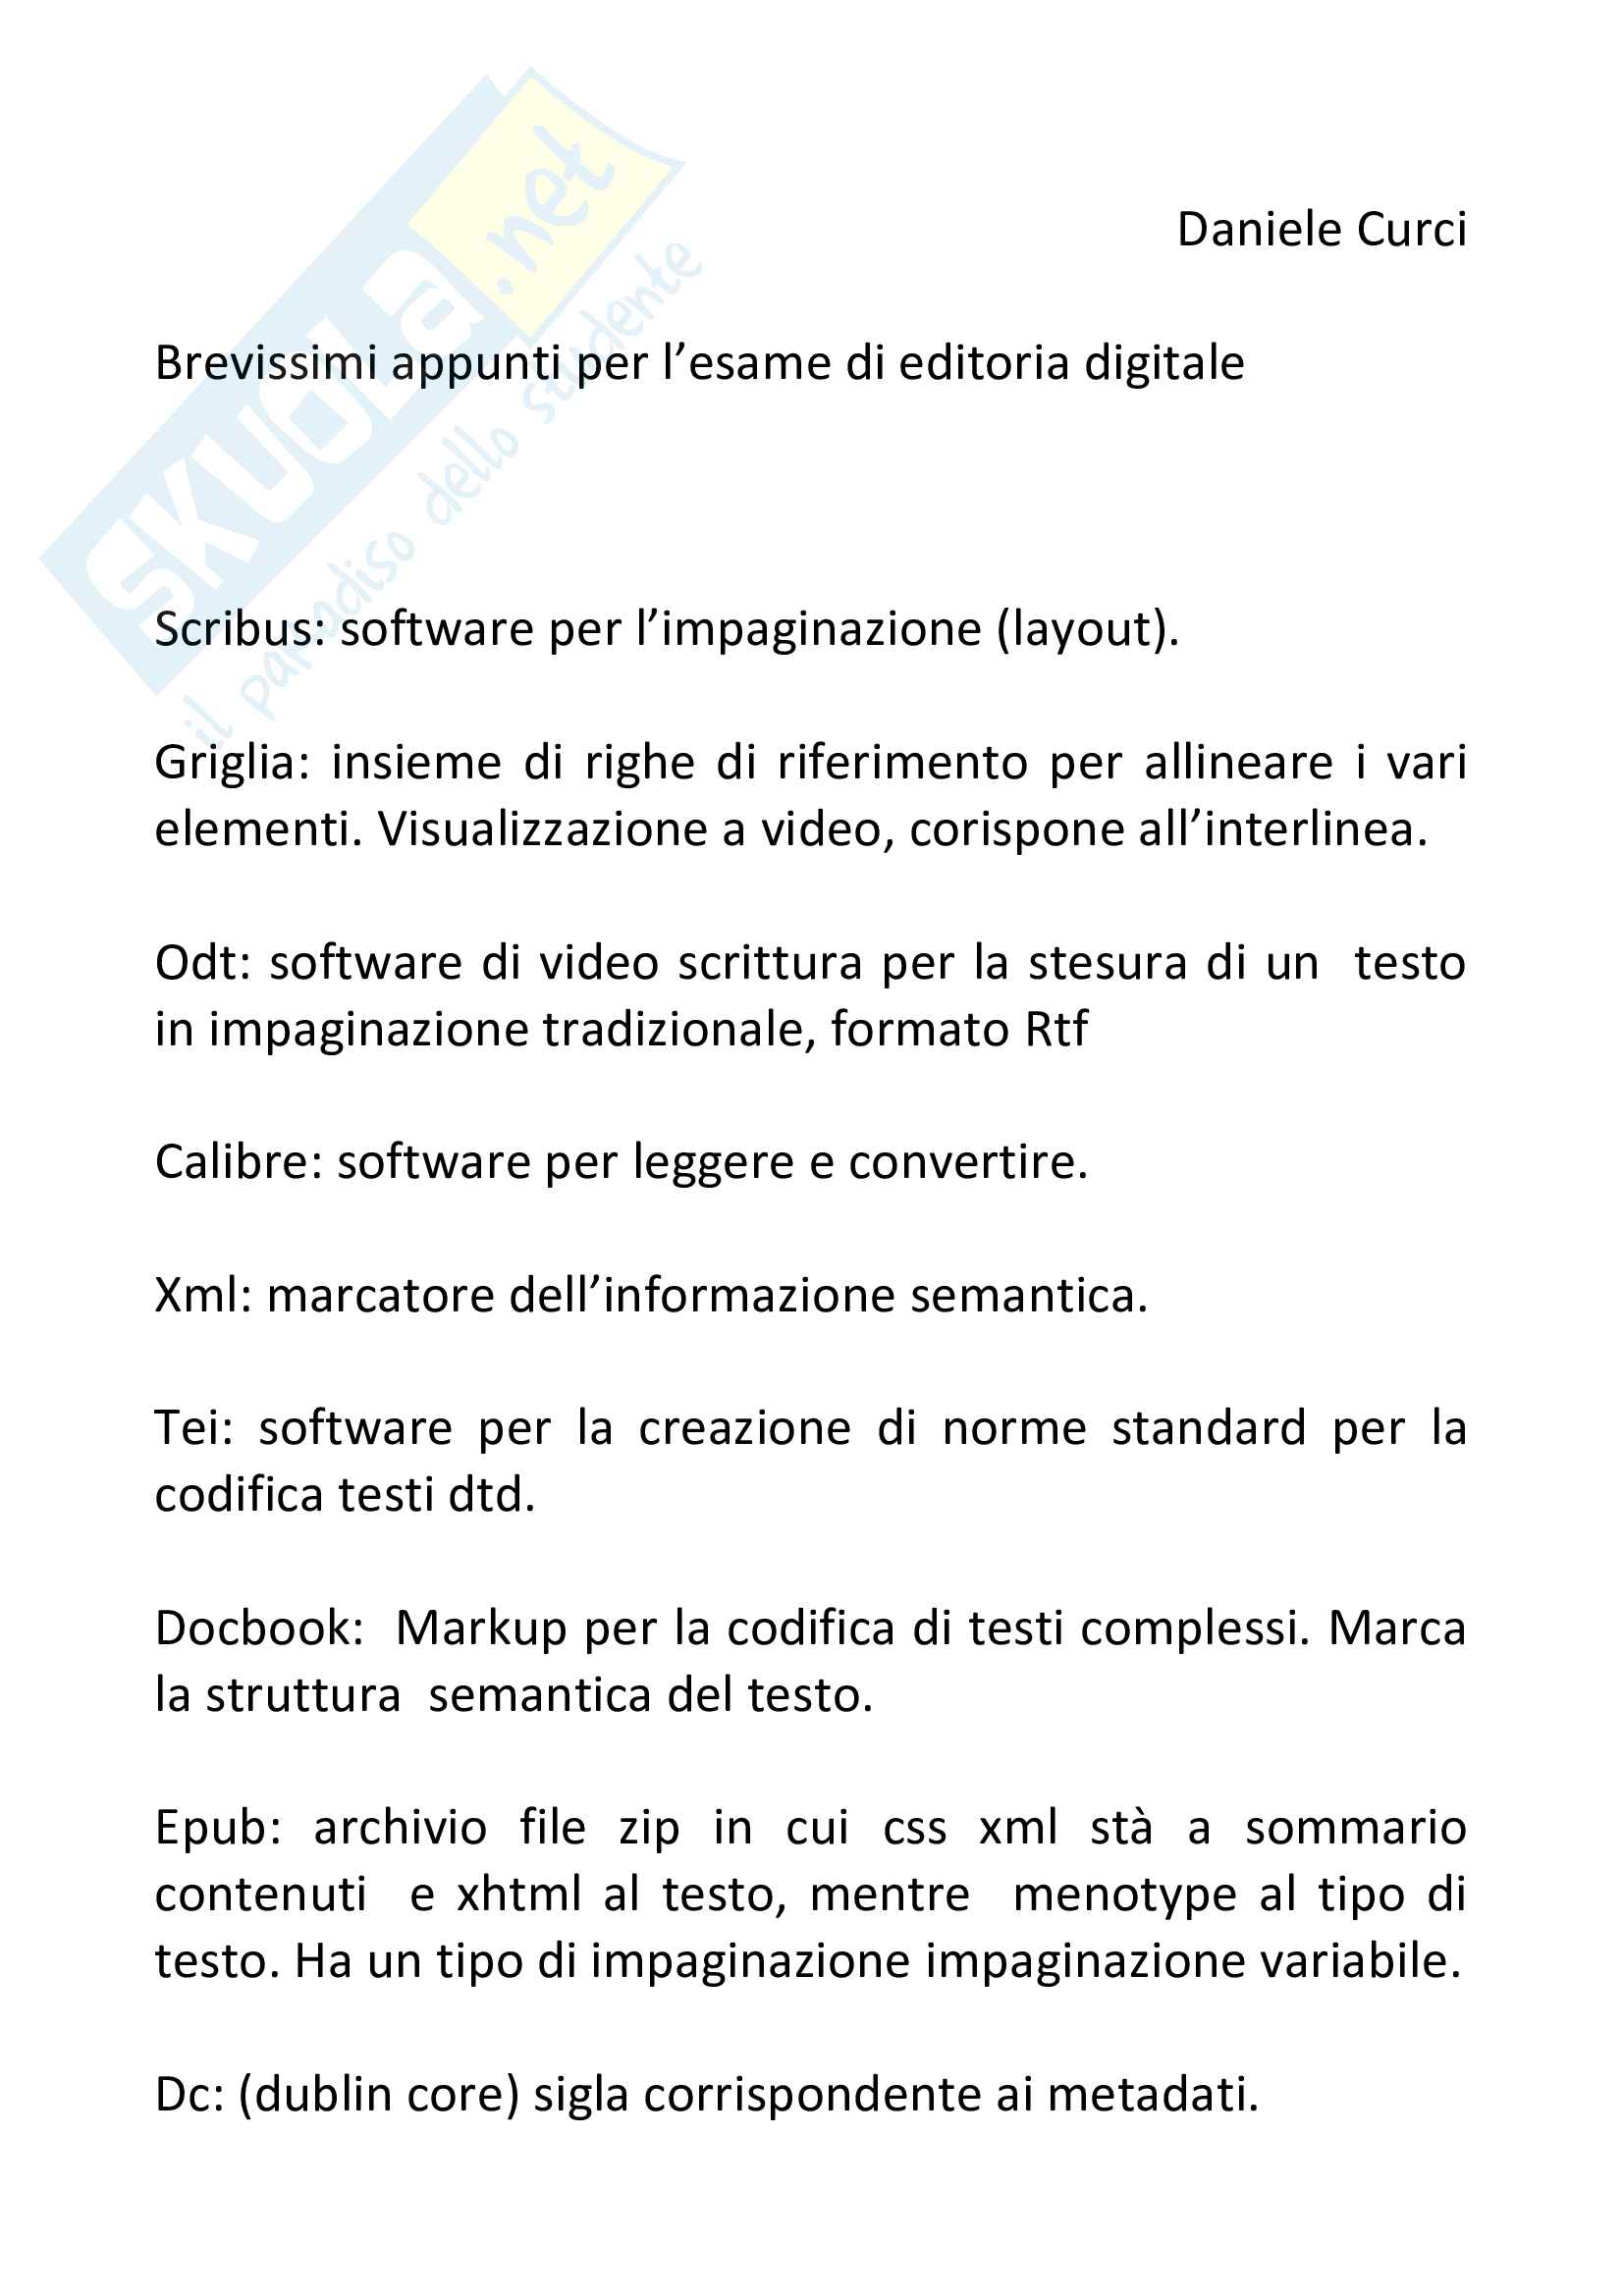 Appunti Editoria digitale